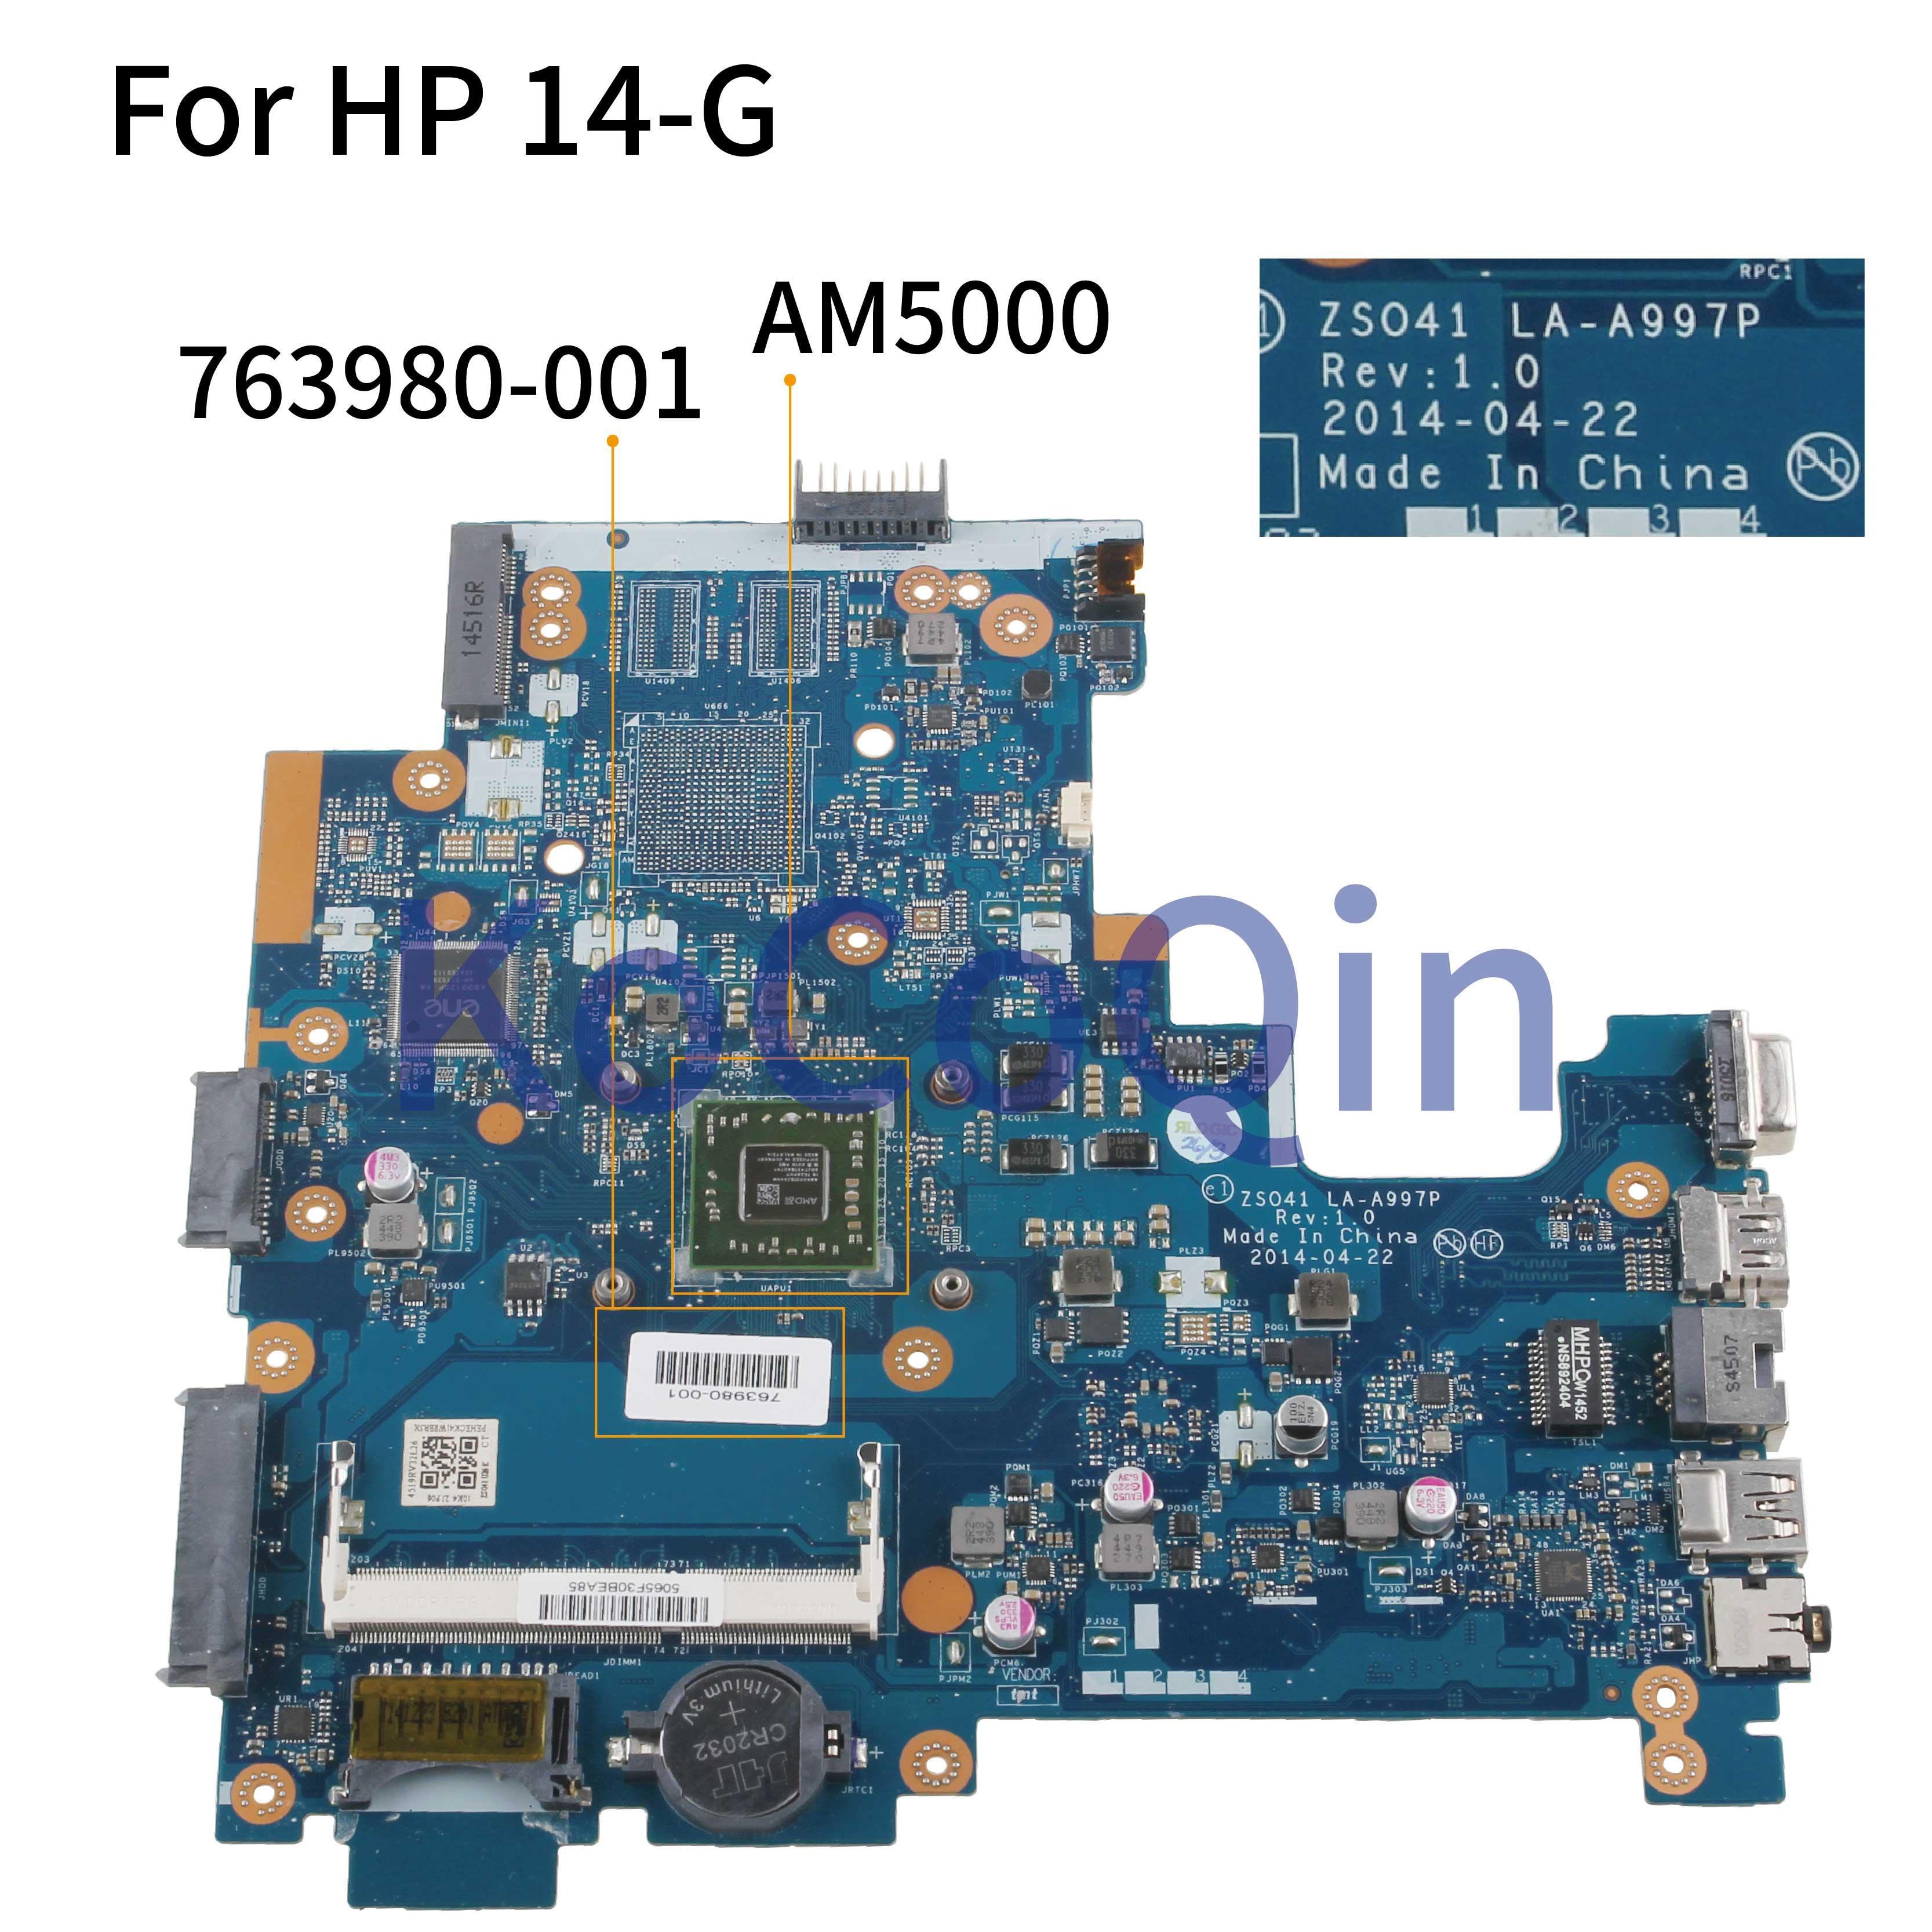 KoCoQin placa base para portátil HP 14-G 245 G3 Core AM5000 placa base 763980-001 763980-501 ZS041 LA-A997P